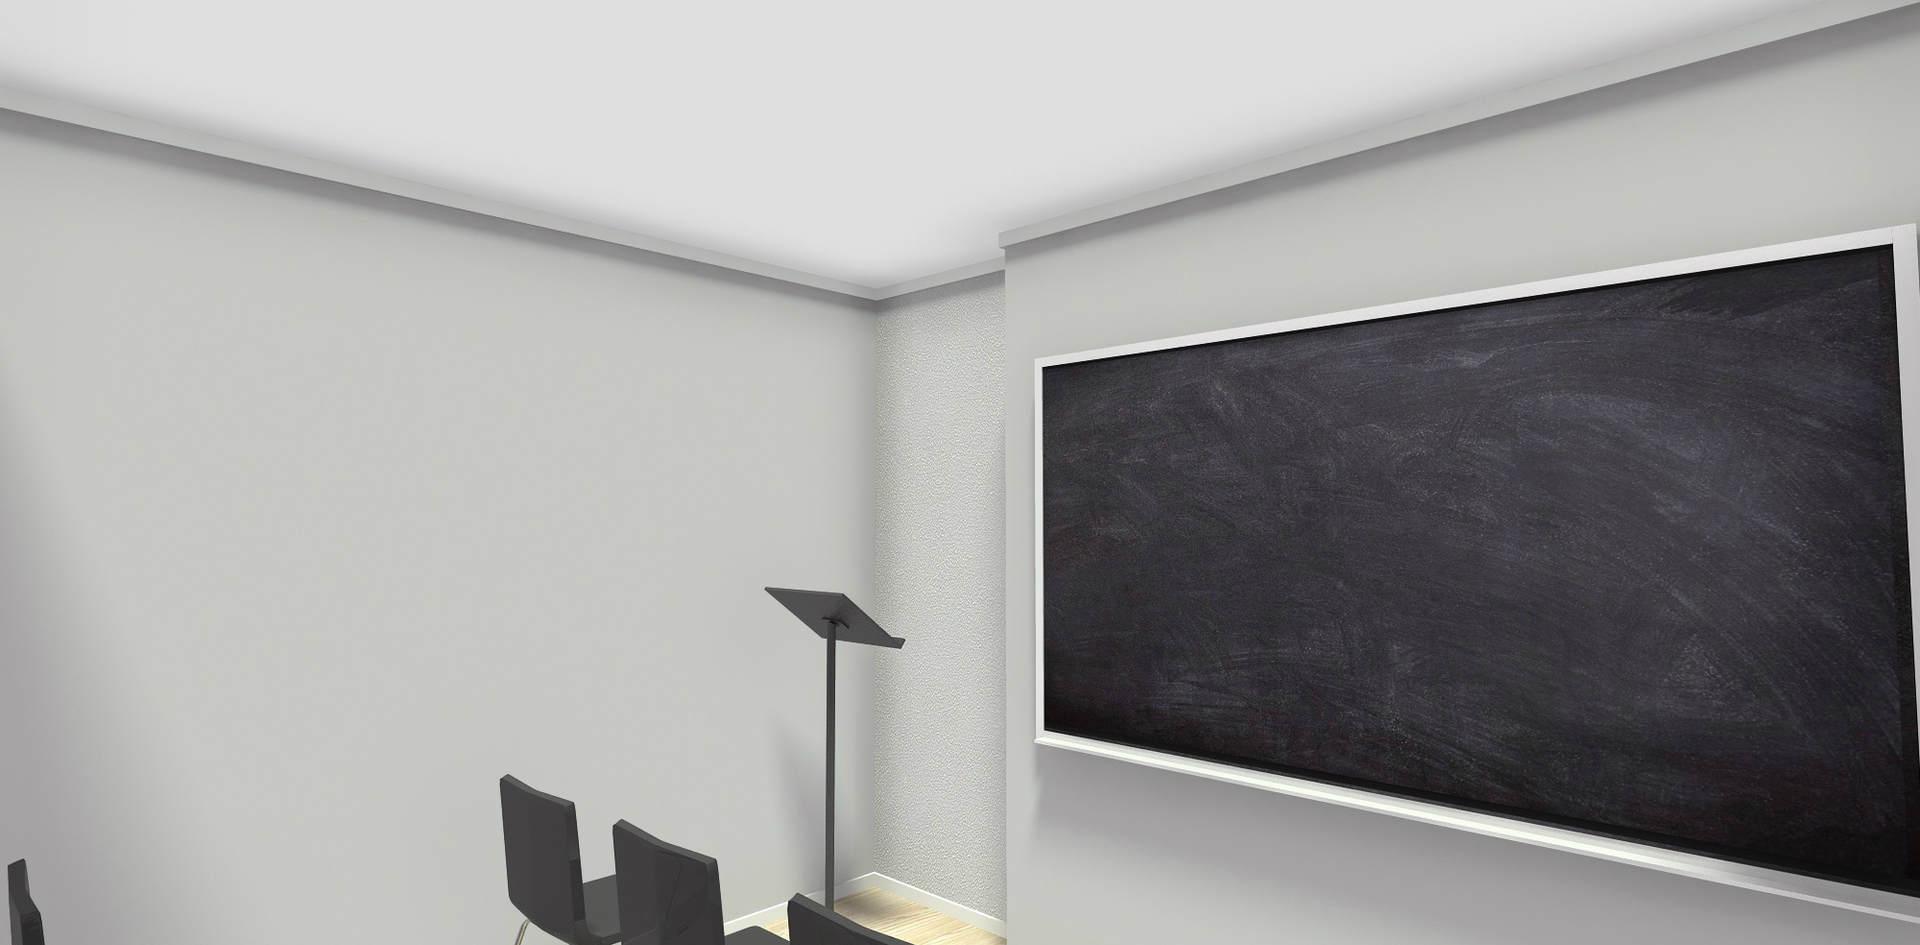 The GRAMOM Classroom #Training Center (Laurel, Maryland) by NanaMoDixonPHD